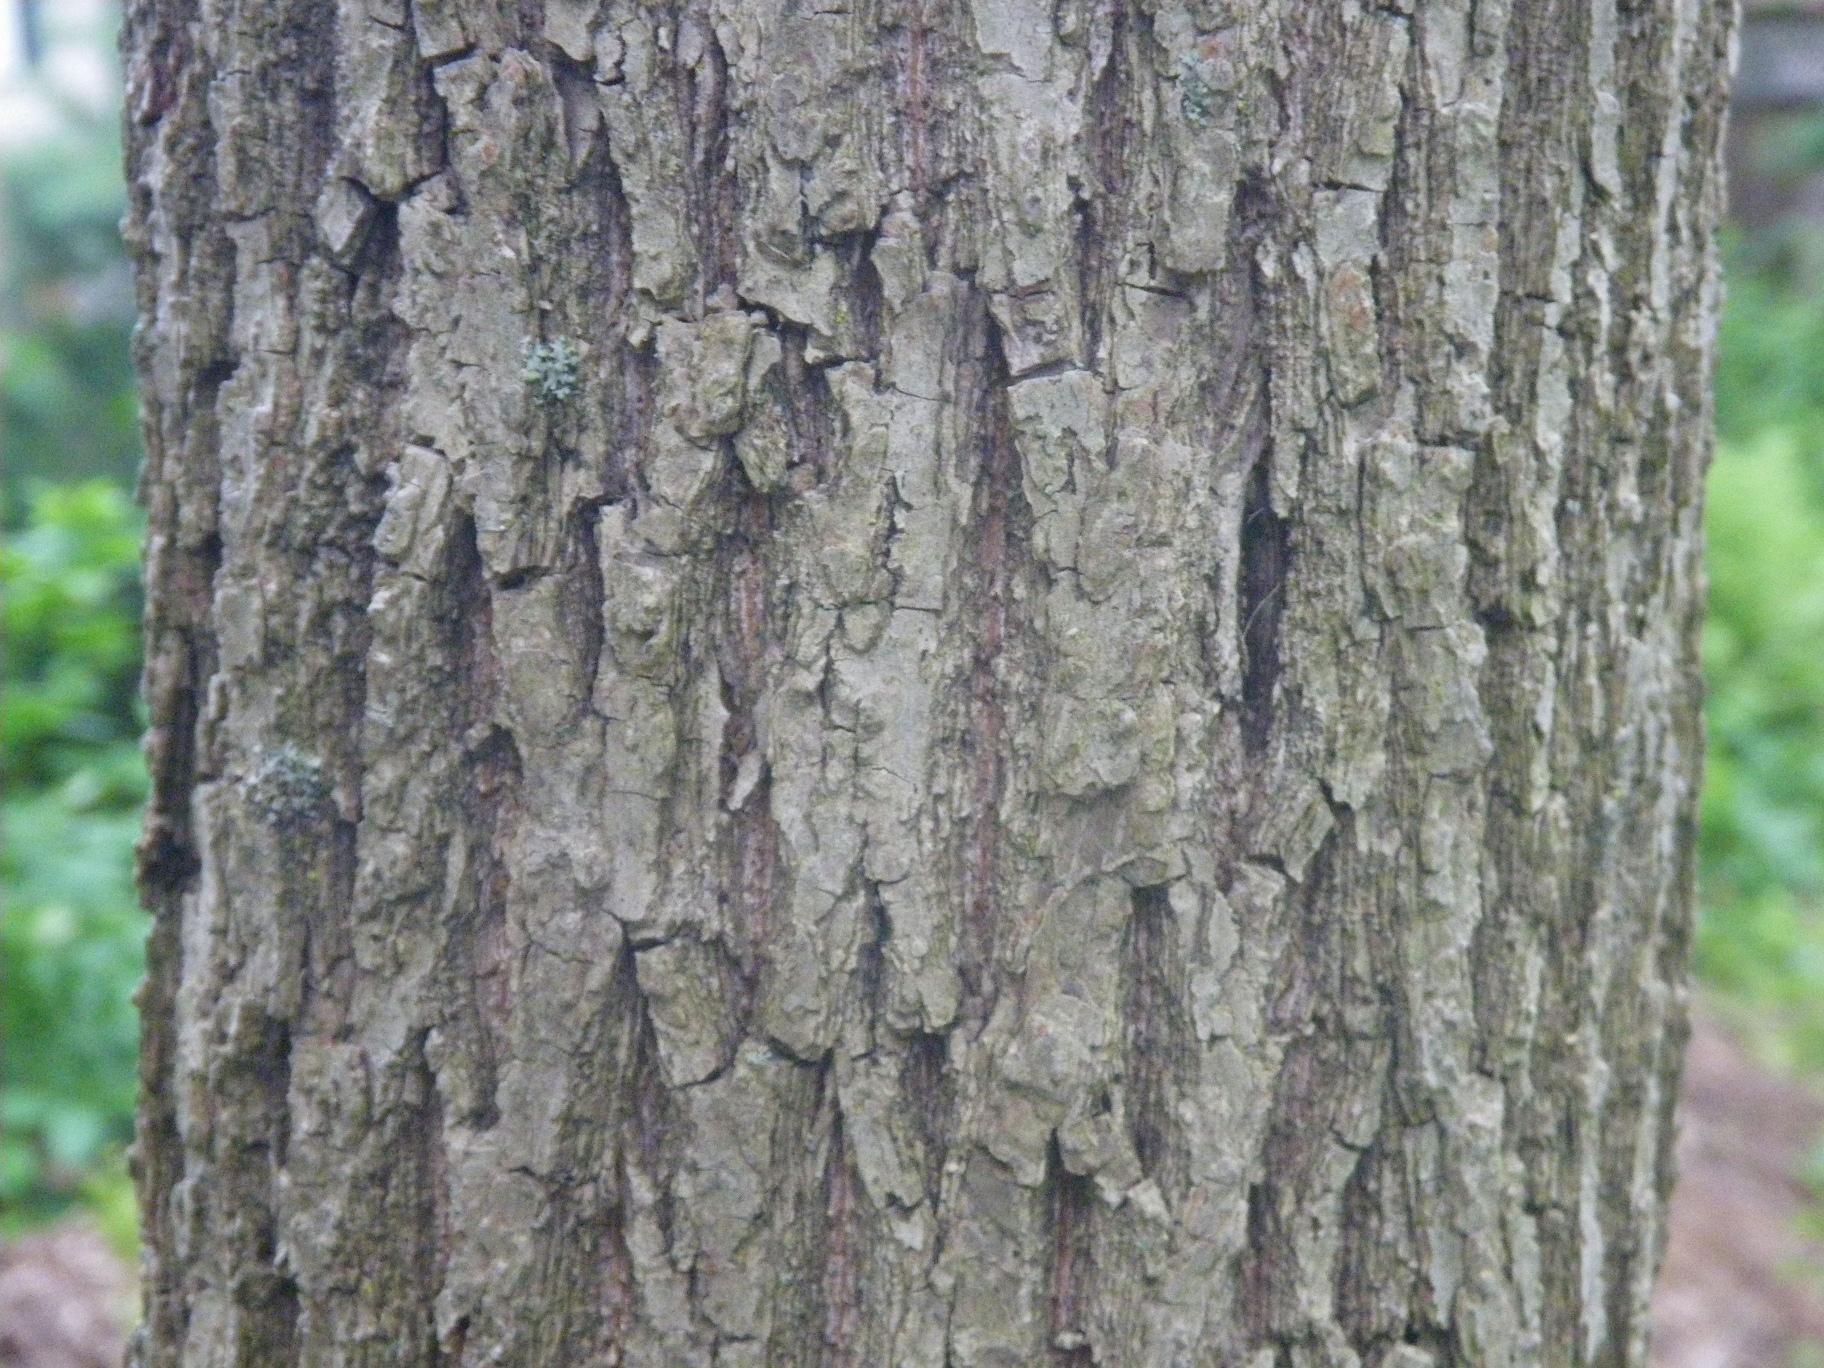 Juglans nigra_Eastern Black Walnut_bark_1_Lexington, MA_20120626_Tom Todd_IMGP0854.jpg